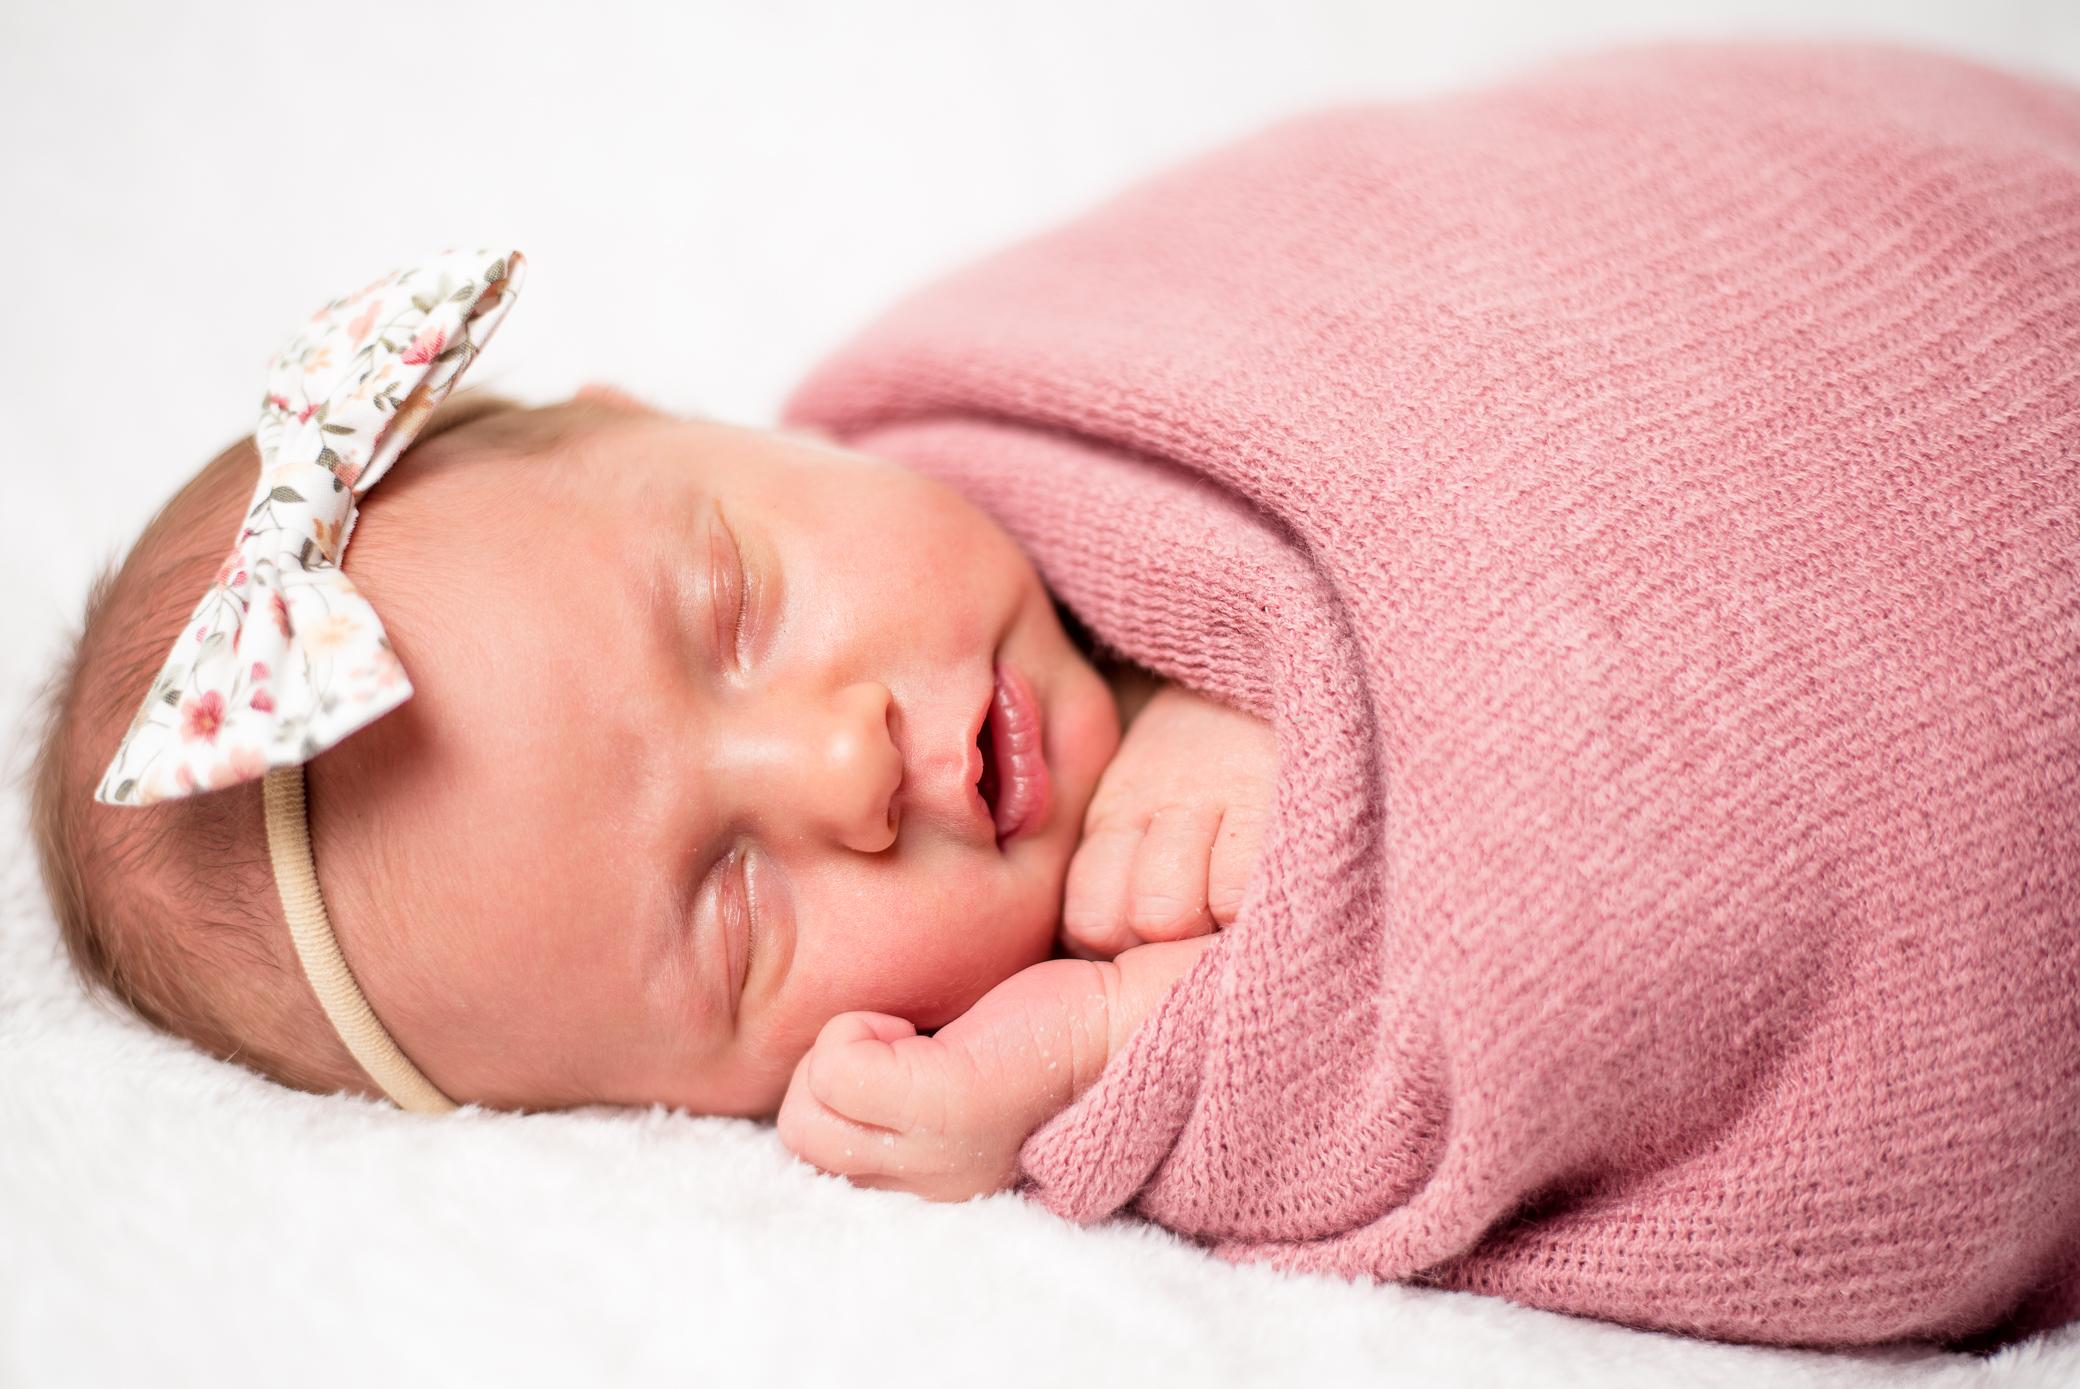 WEB_ONLY_Rylee_Holt_Newborns_CarolLee_Photo-12.jpg